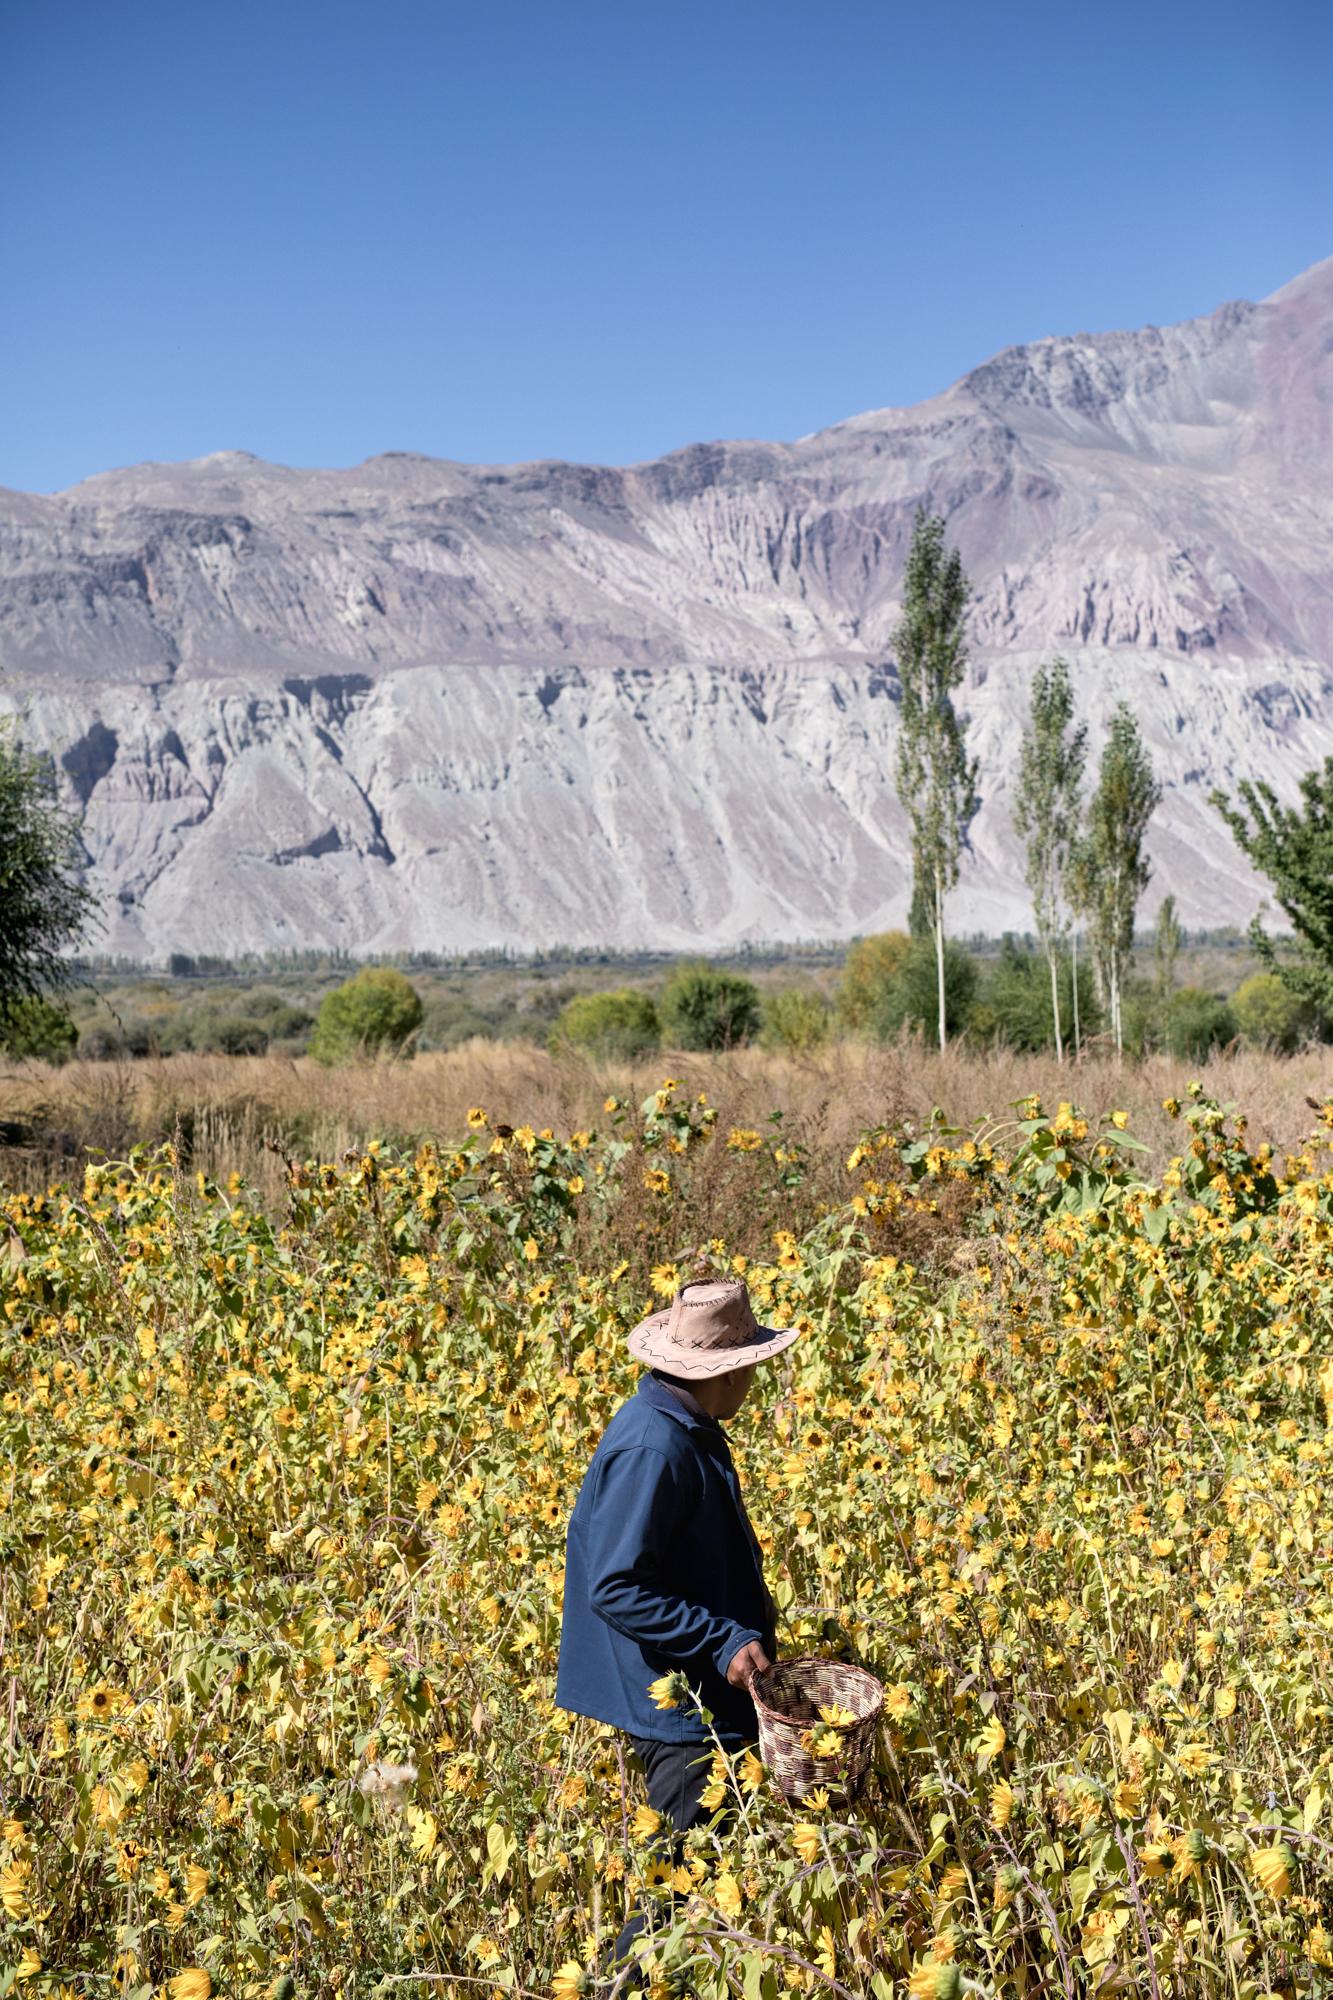 Land of High Passes - Jody Daunton - (5 of 7).jpg